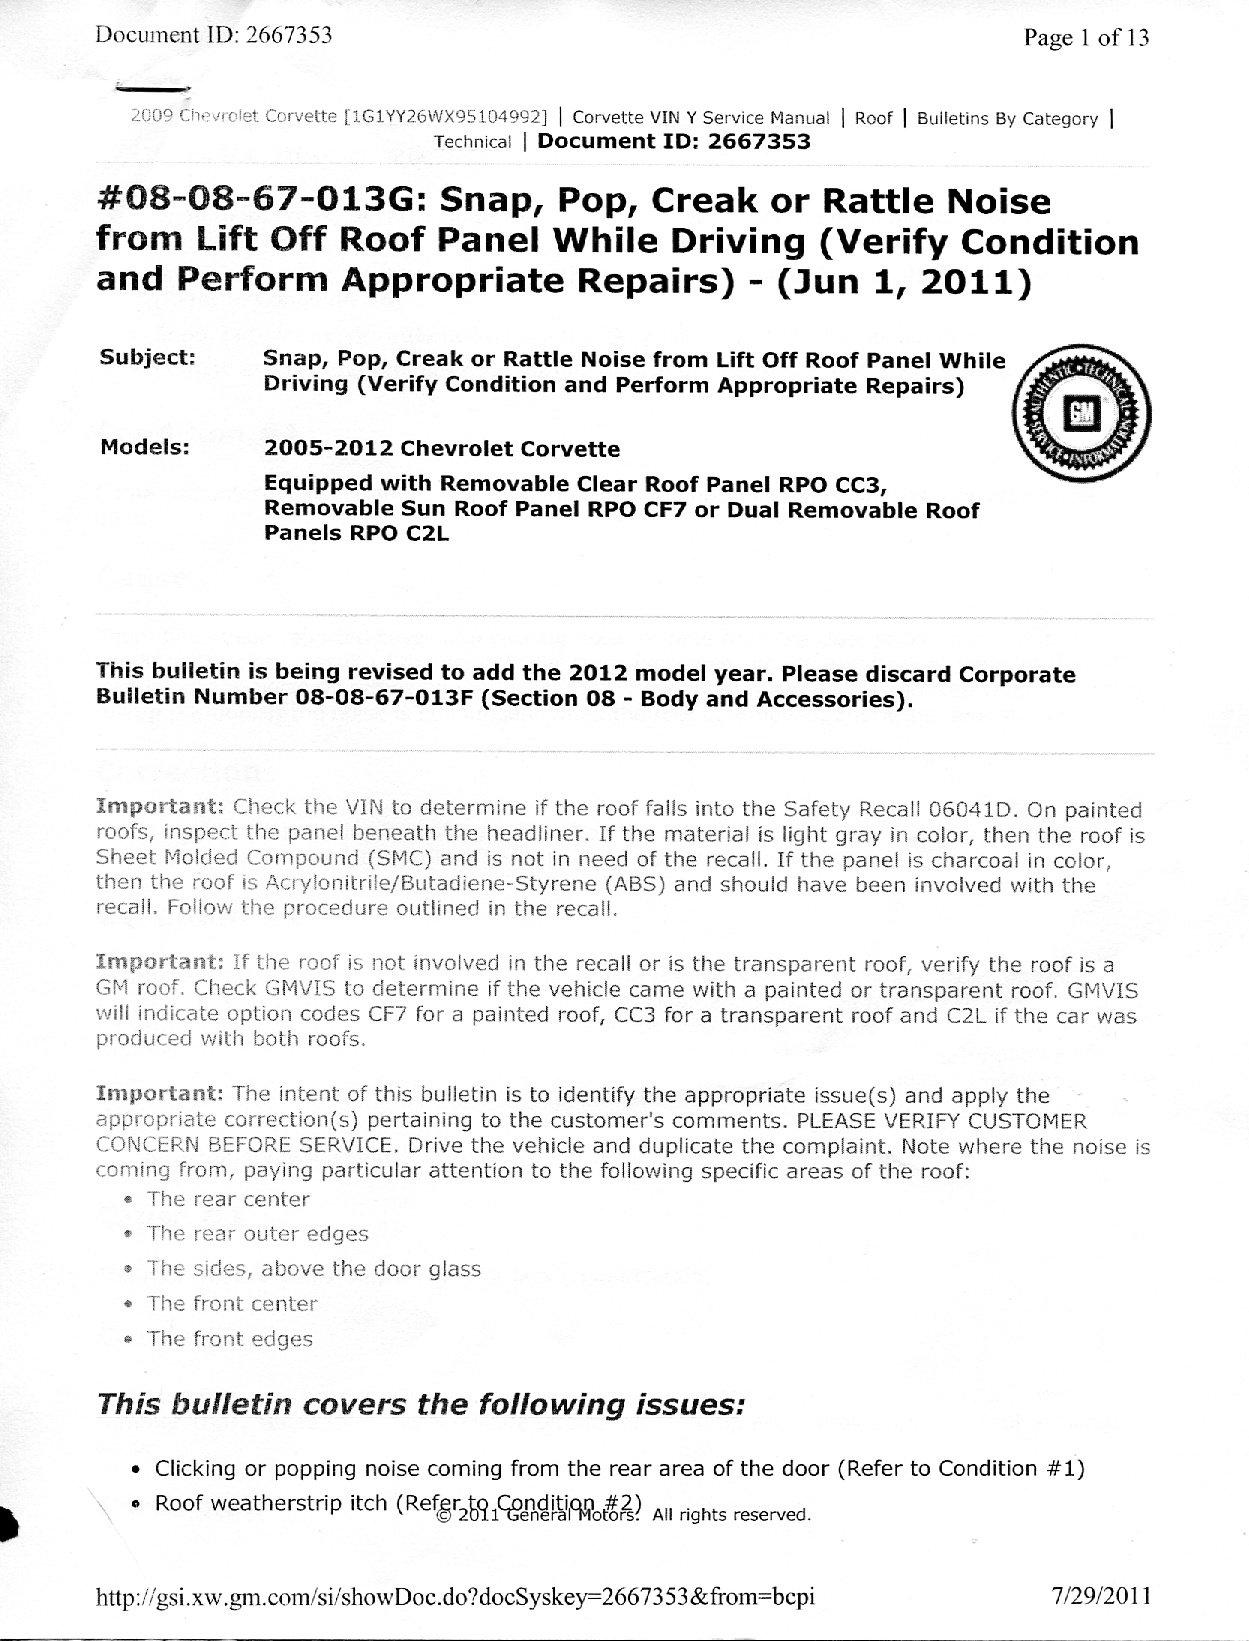 Creaking Roof Issue Has A Simple Official Fix Page 7 Corvetteforum Chevrolet Corvette Forum Discussion